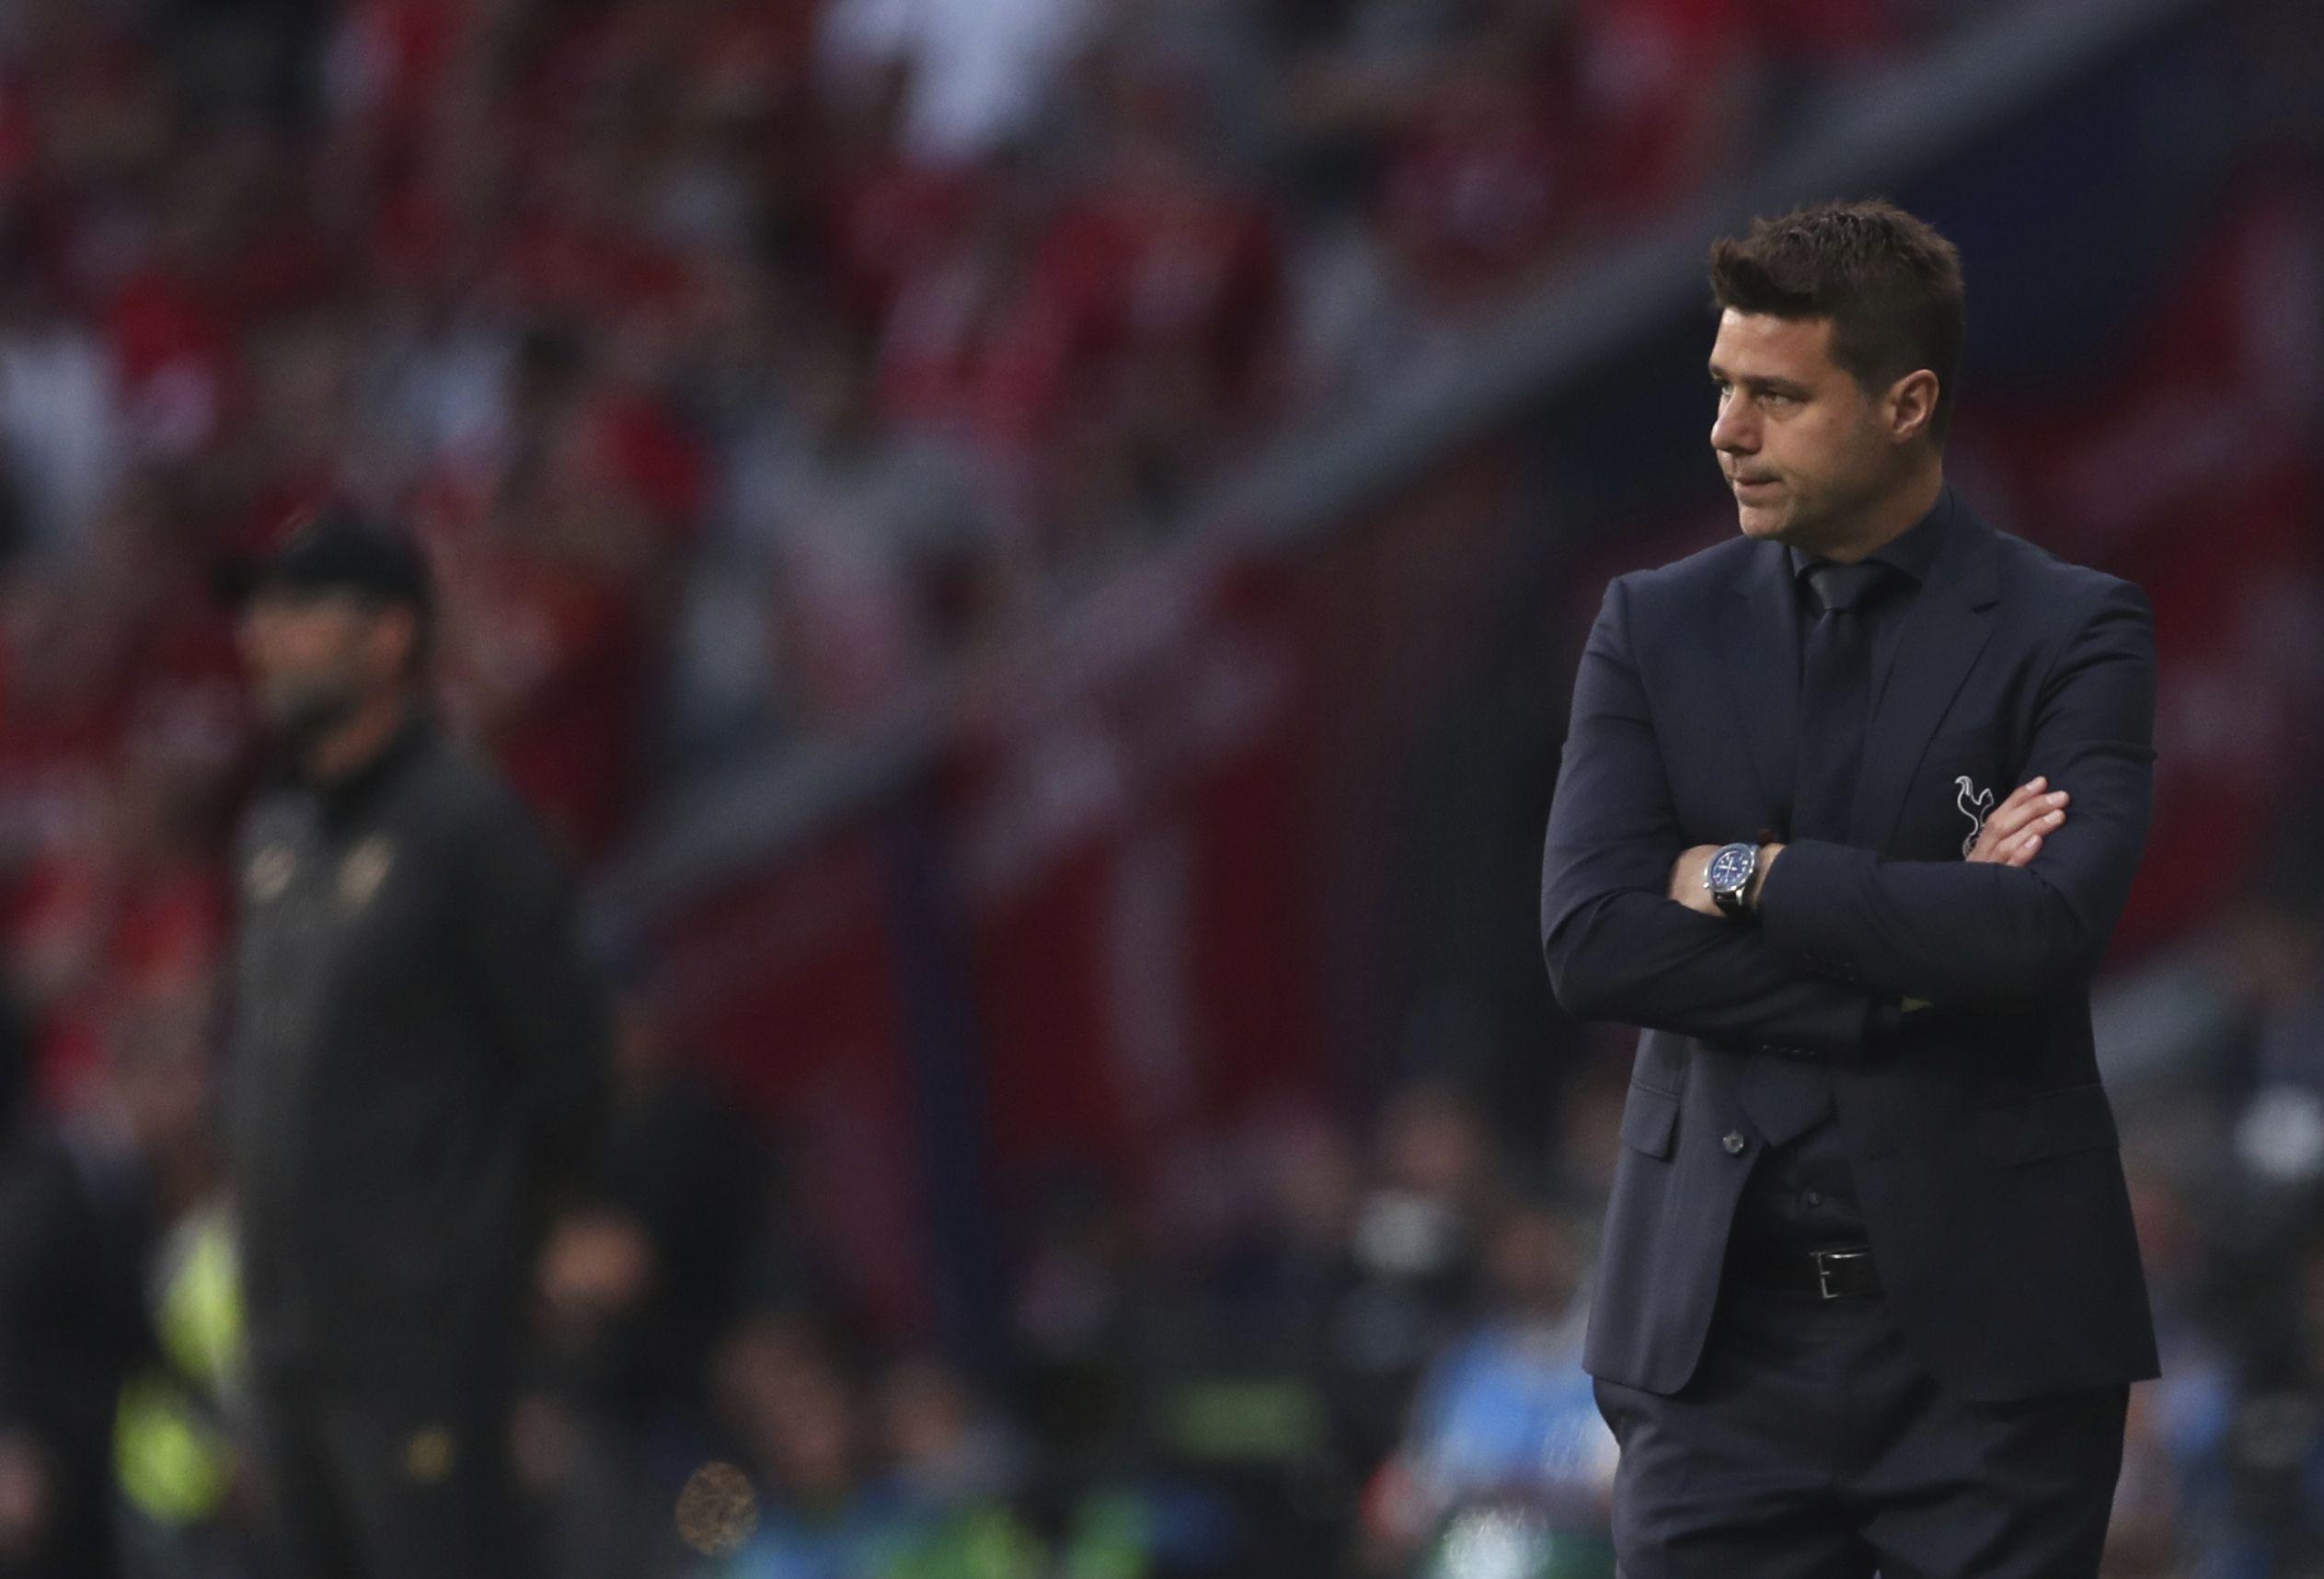 Campeones: Liverpool suma 6ta corona, vence 2-0 a Tottenham